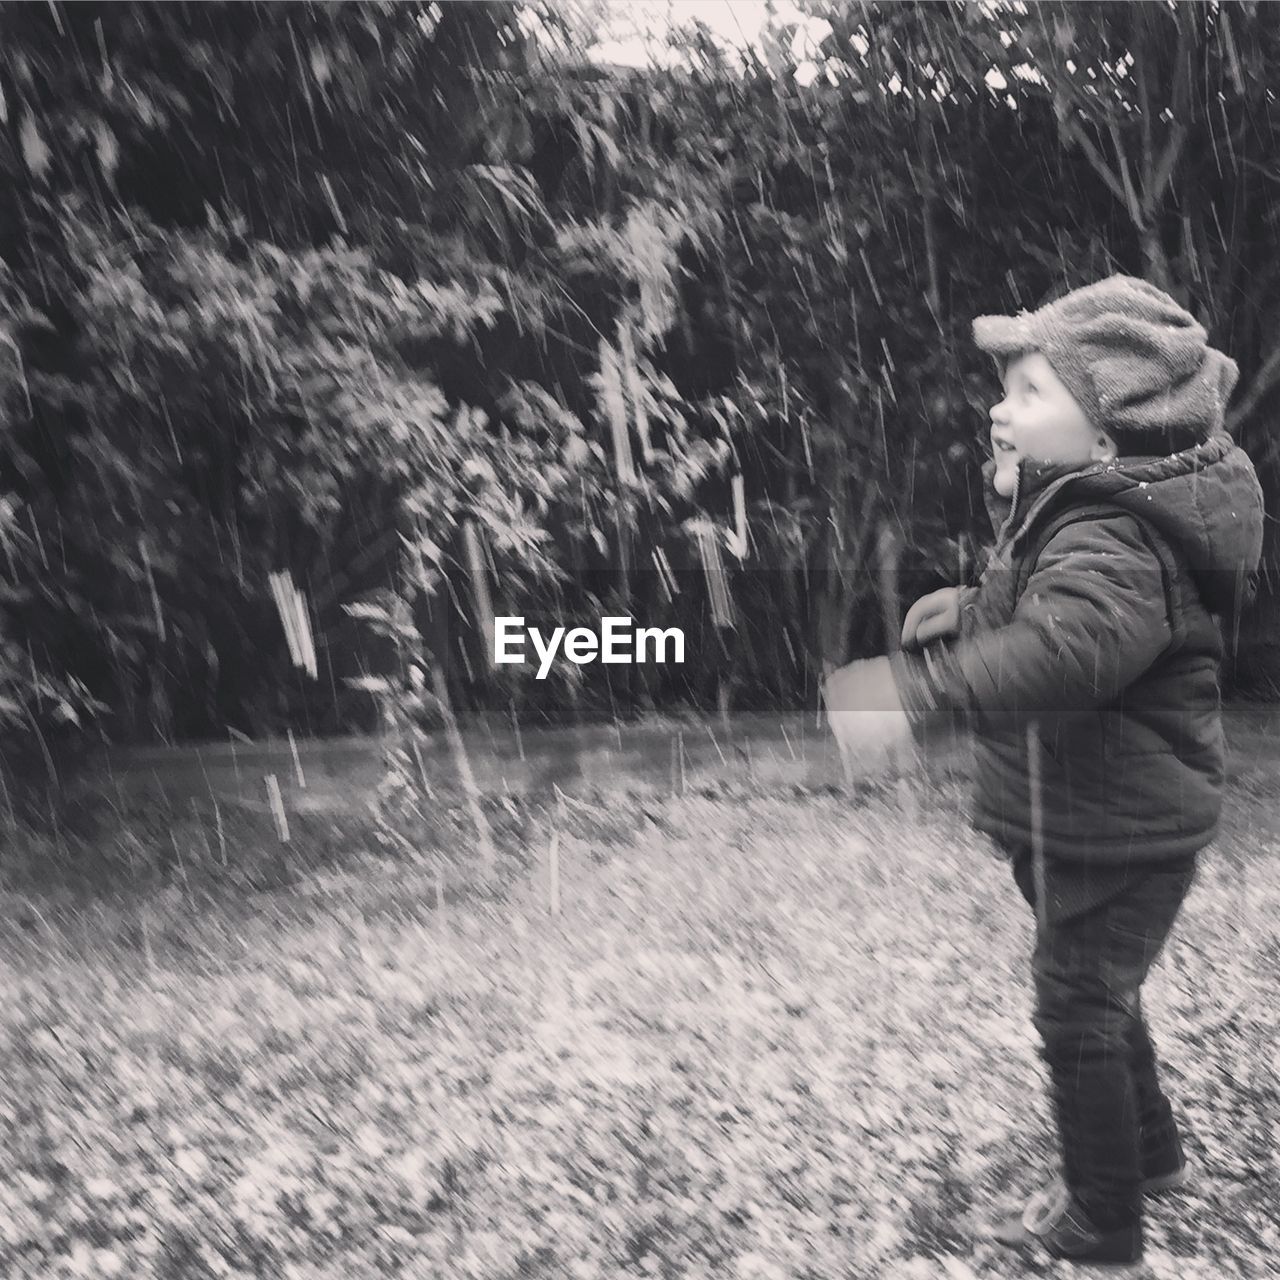 Cute boy enjoying snowfall outdoors